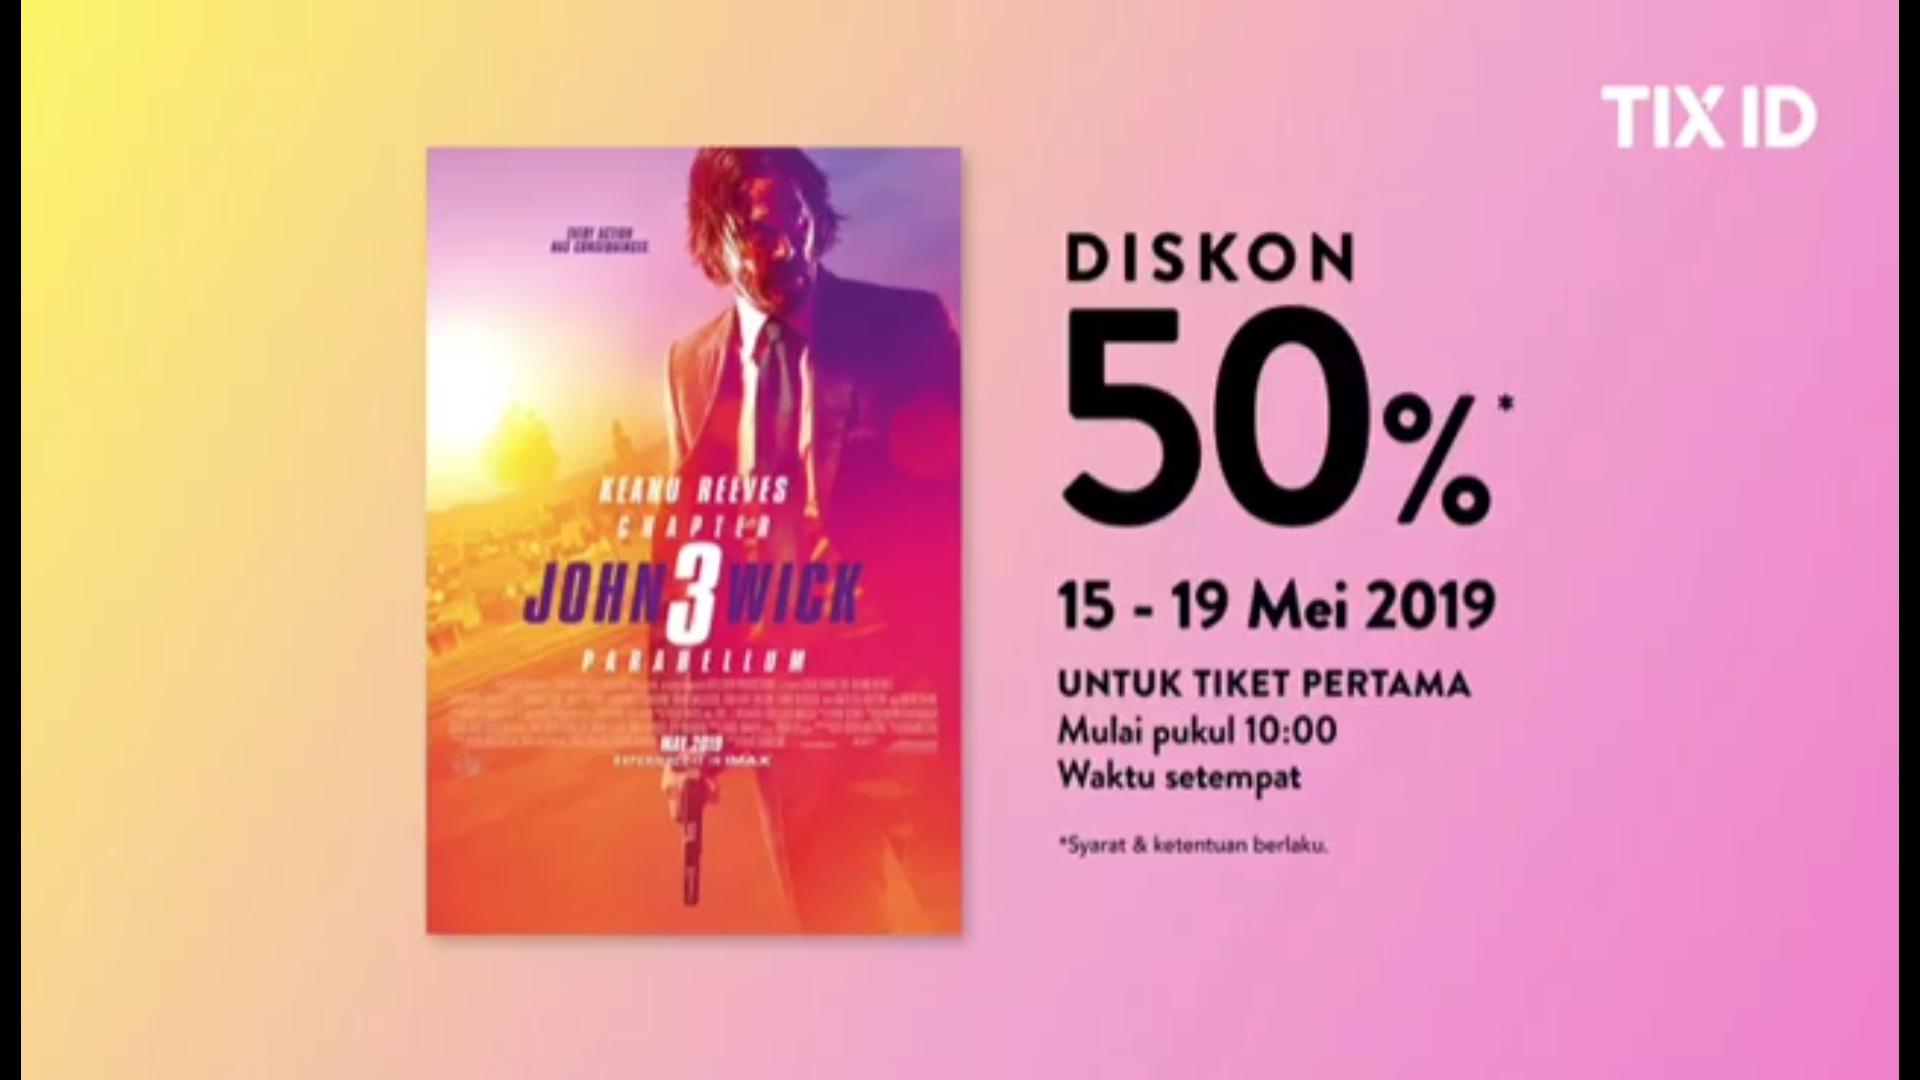 TIX.ID Promo Diskon 50% Untuk Tiket Pertama Nonton Film John Wick: Chapter 3 – Parabellum